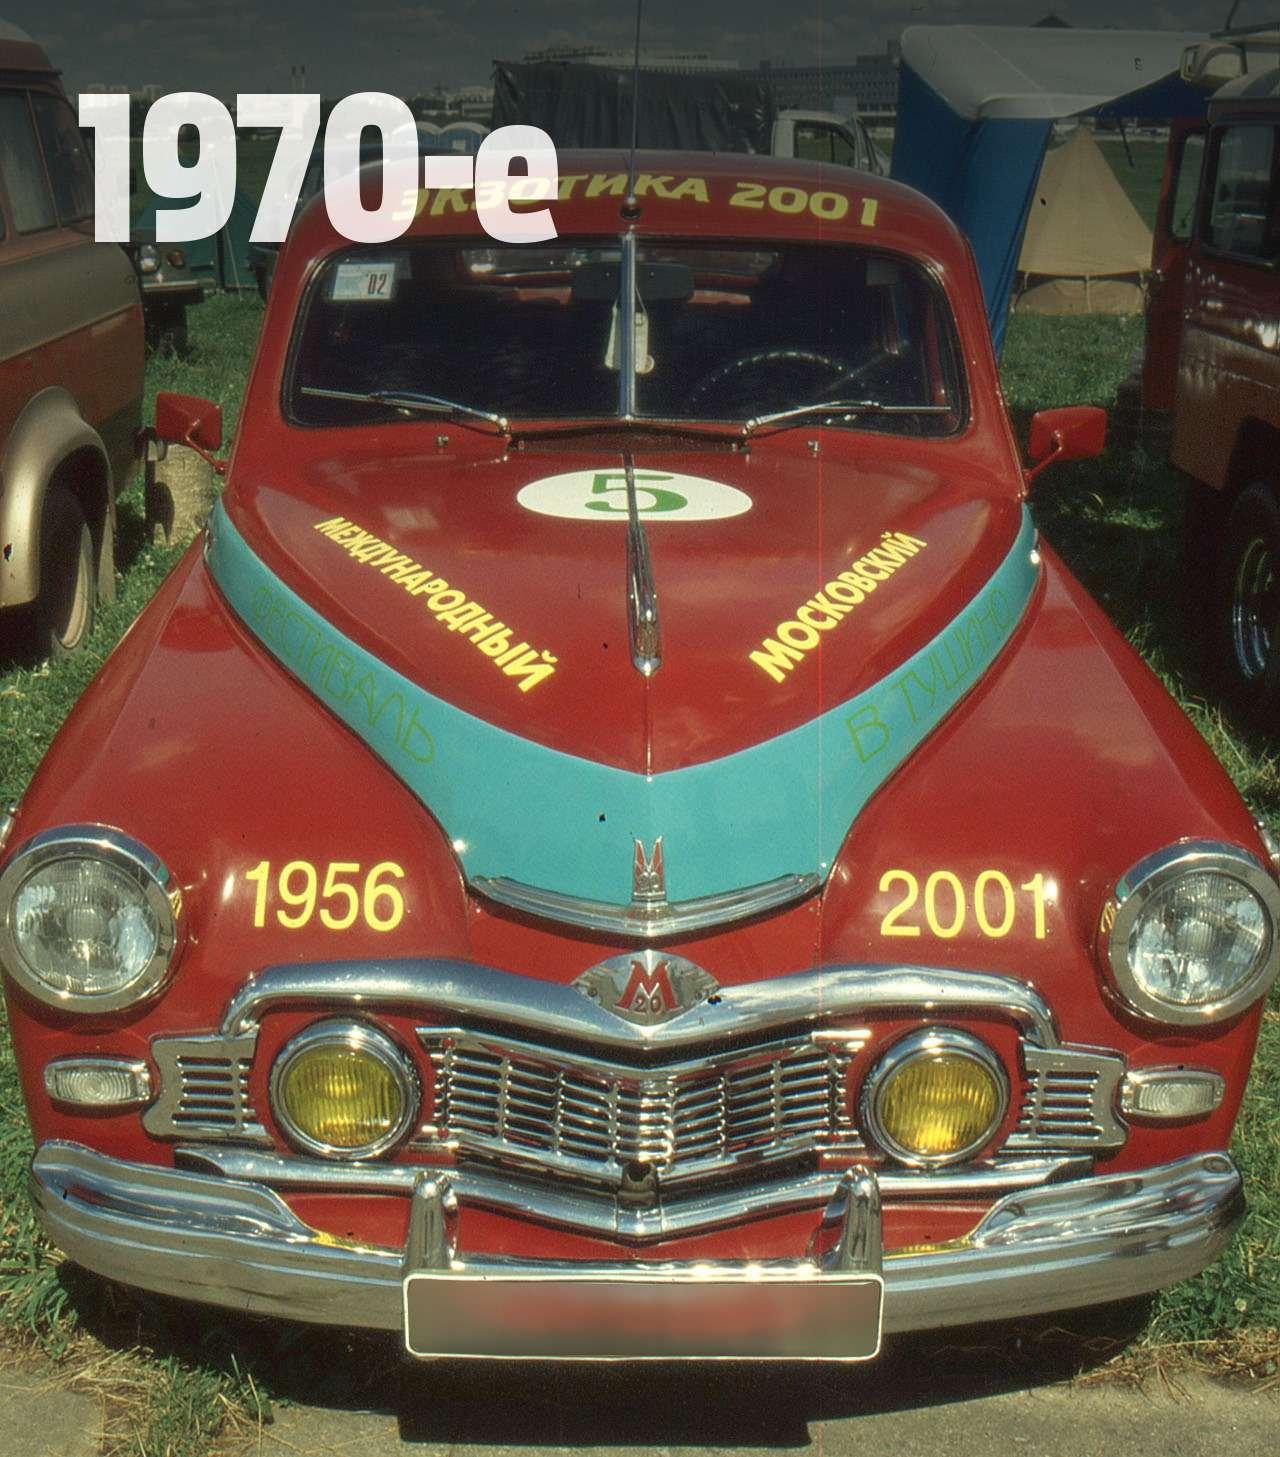 Тюнинг по-русски: отоплеток 60-х годов досиних писалок— фото 904312